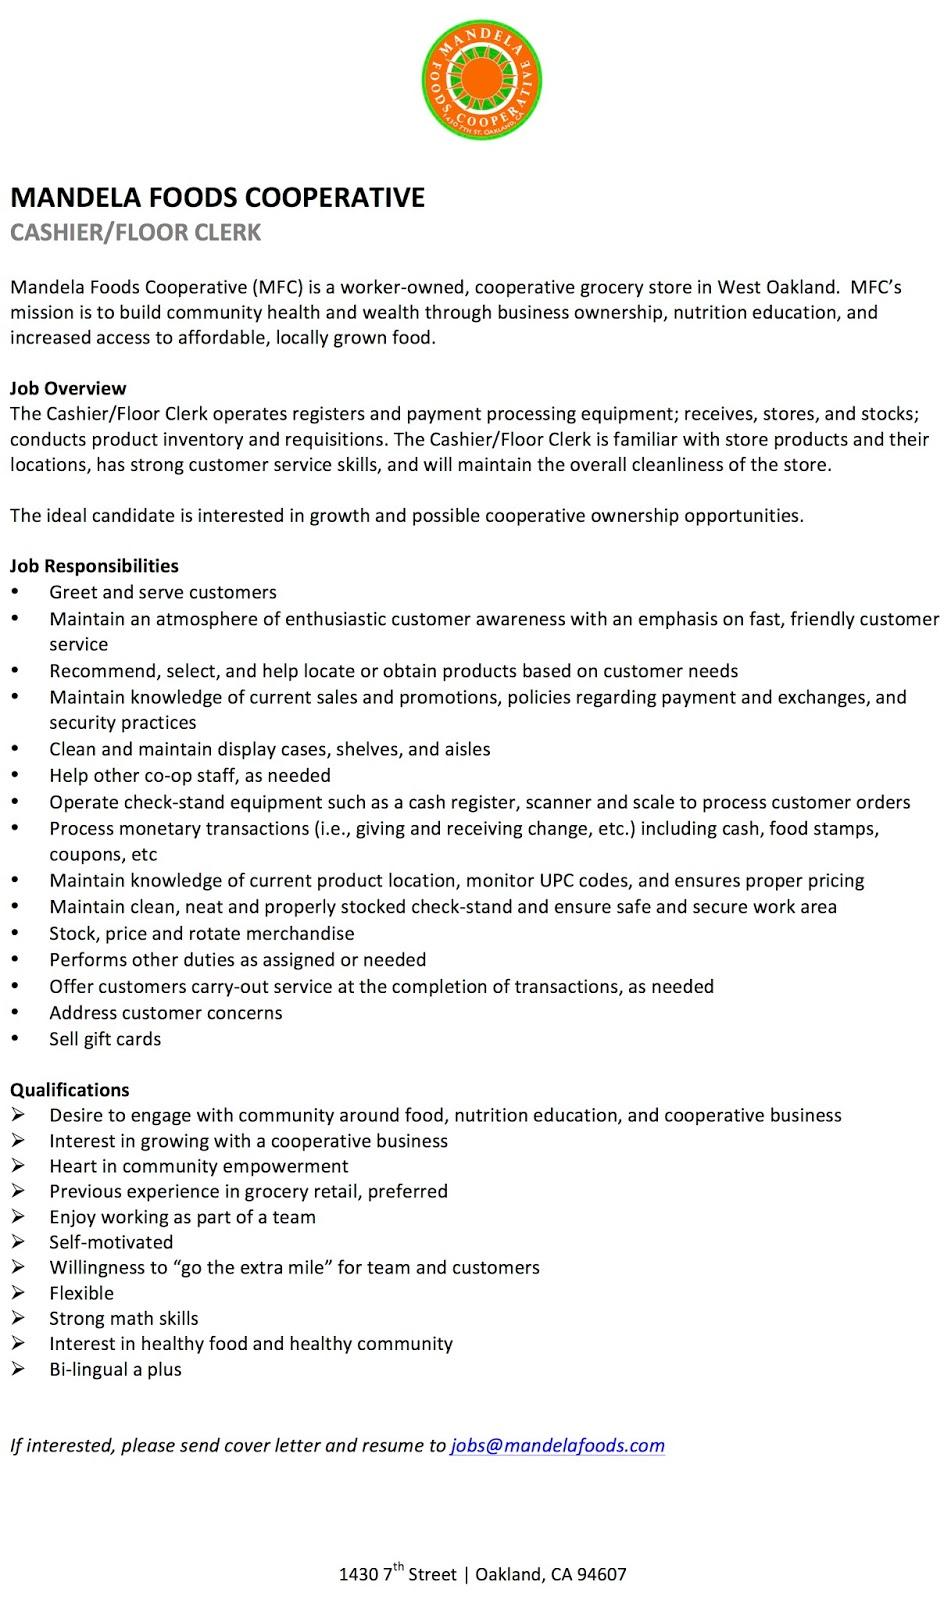 Audit Associate Resume Examples 2019 Audit Associate Resume Objective 2020 audit associate resume audit associate resume examples audit associate resume objective audit associate resume format pwc audit associate resume senior